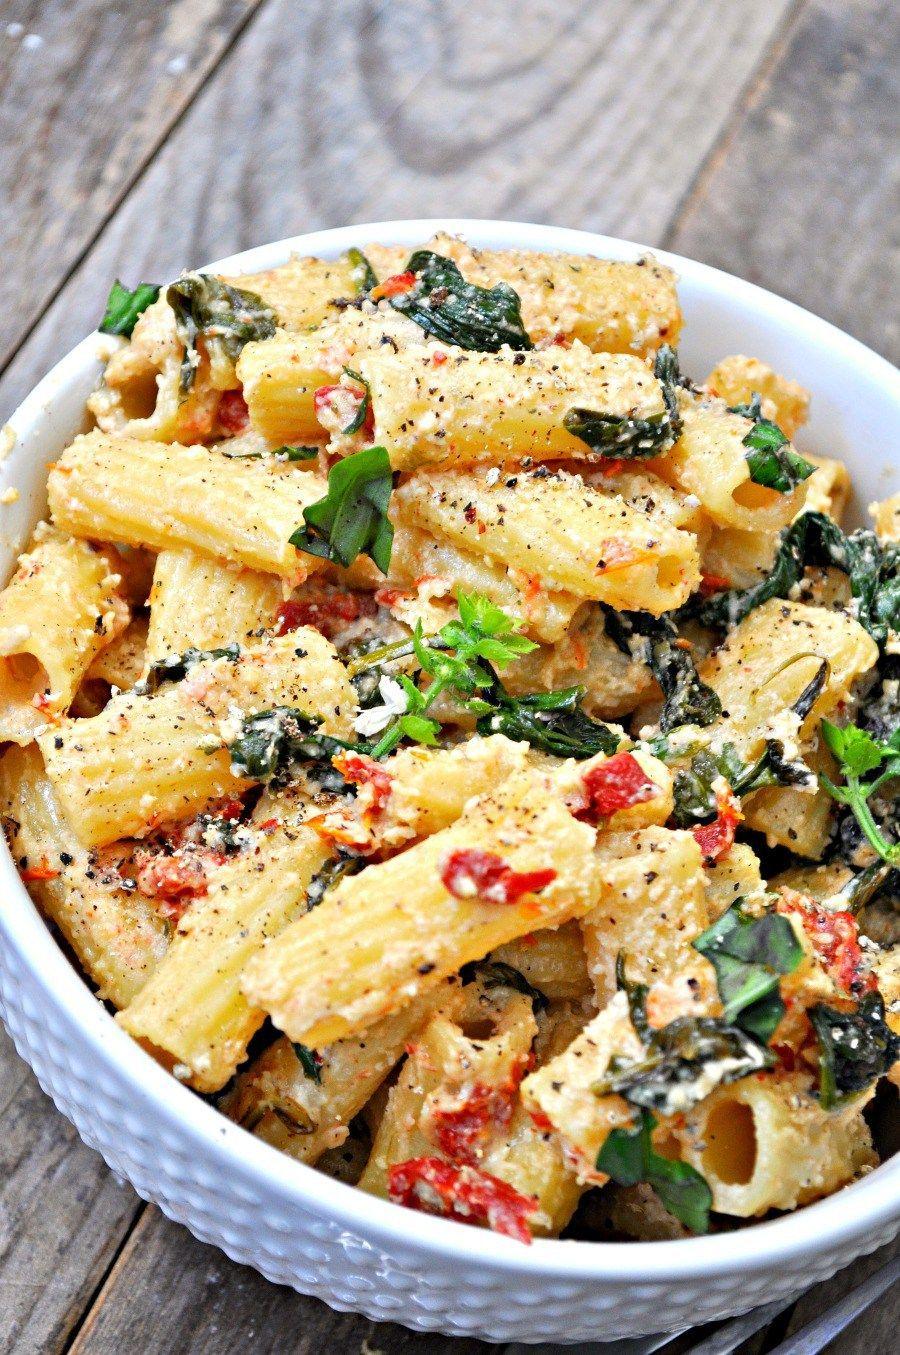 Vegan Tuscan Rigatoni By Rabbit And Wolves In 2020 Vegan Pasta Recipes Vegetarian Recipes Pasta Dishes